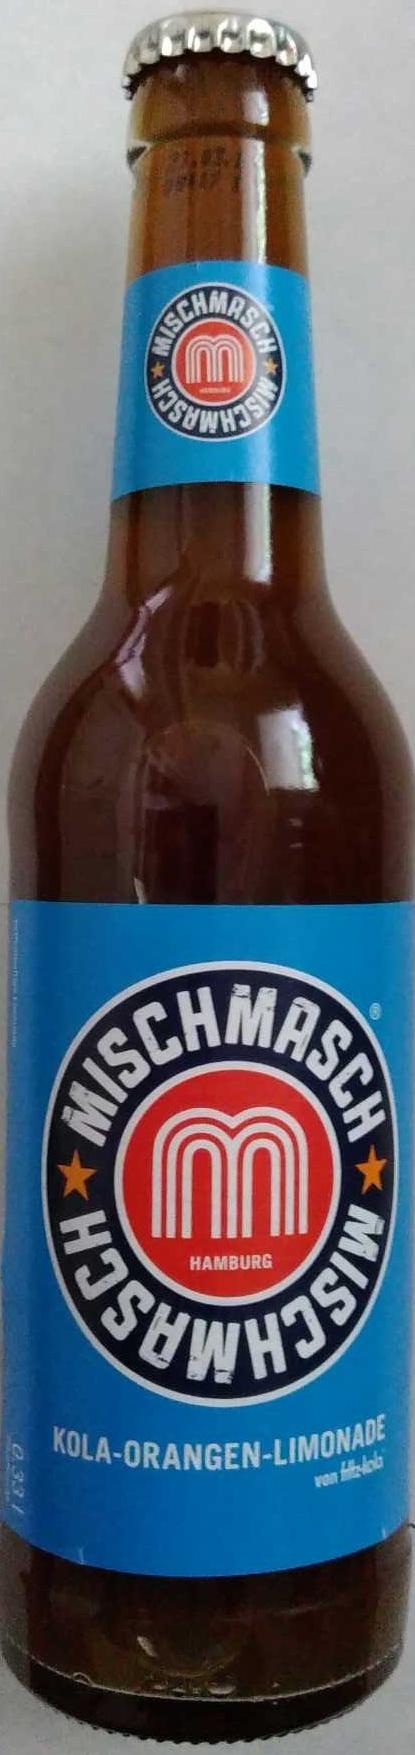 Mischmasch - Produit